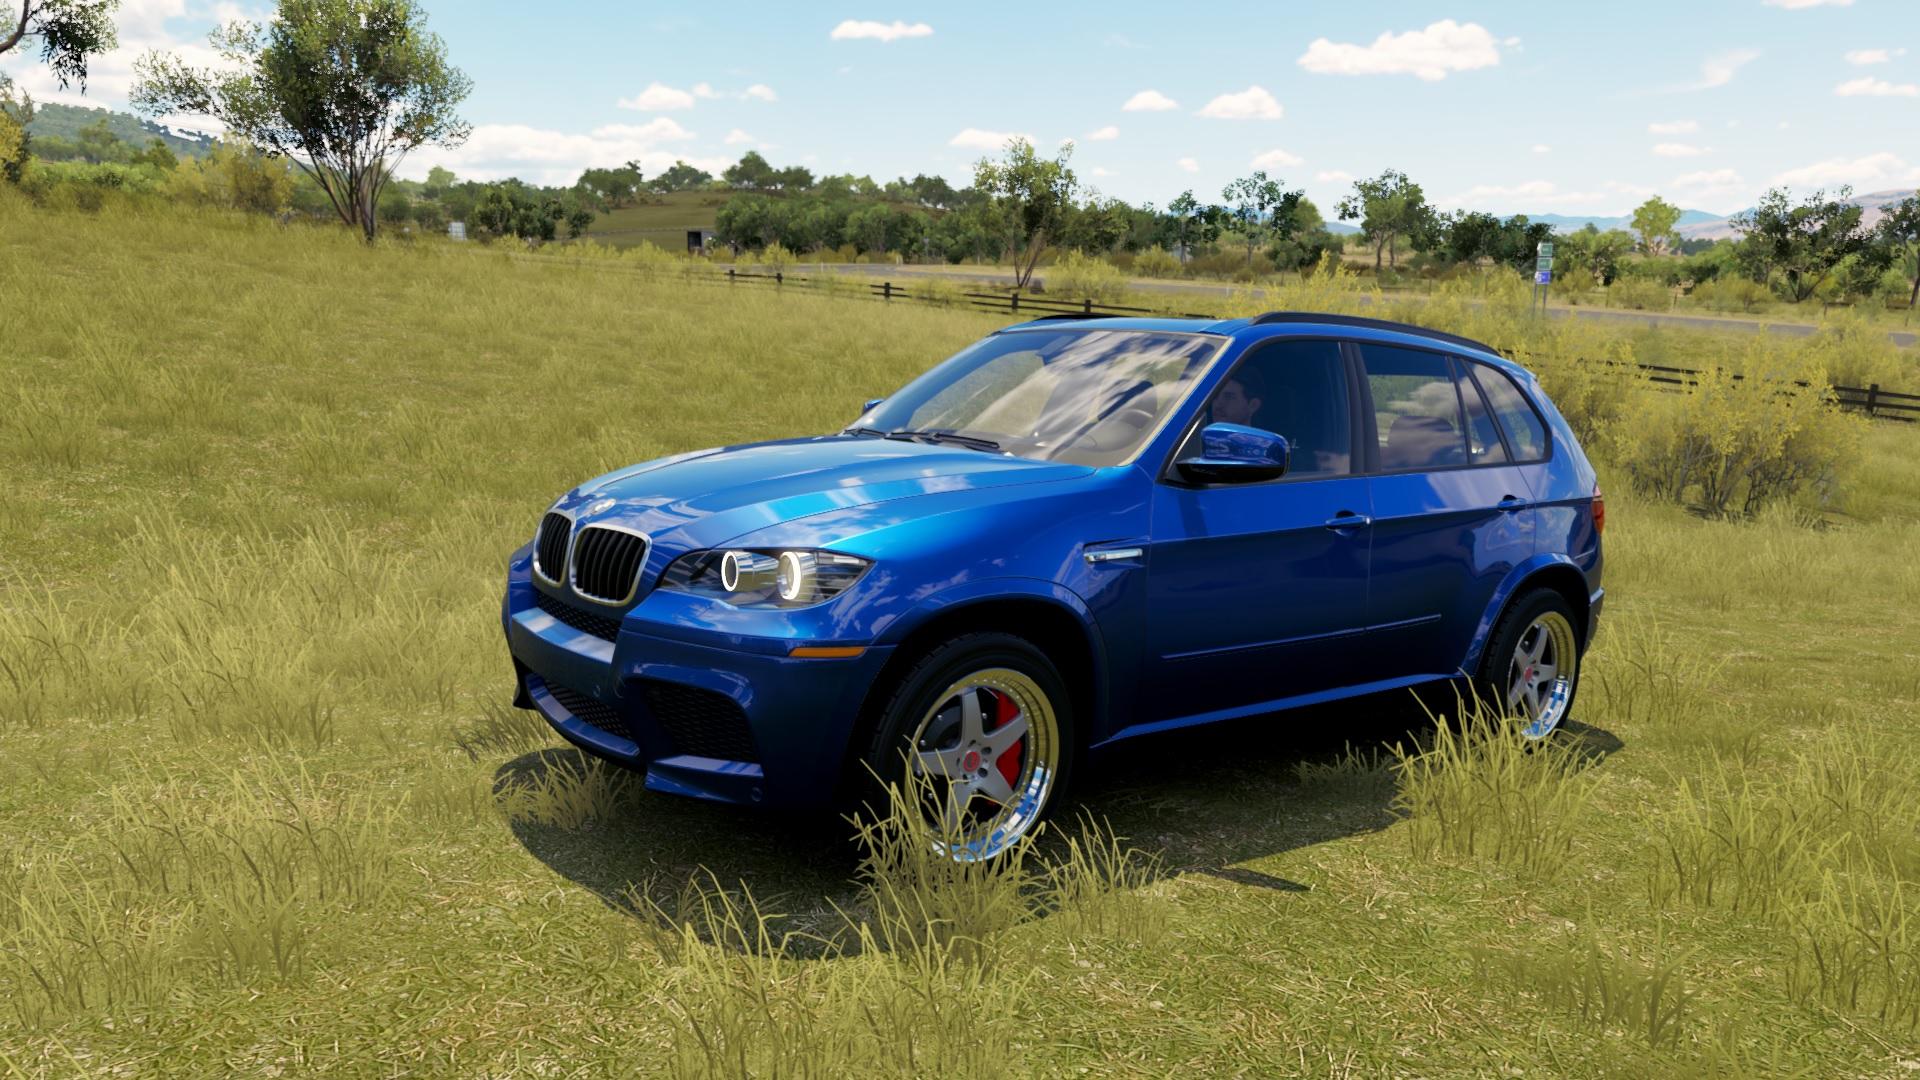 BMW X5 - Forza Horizon 3